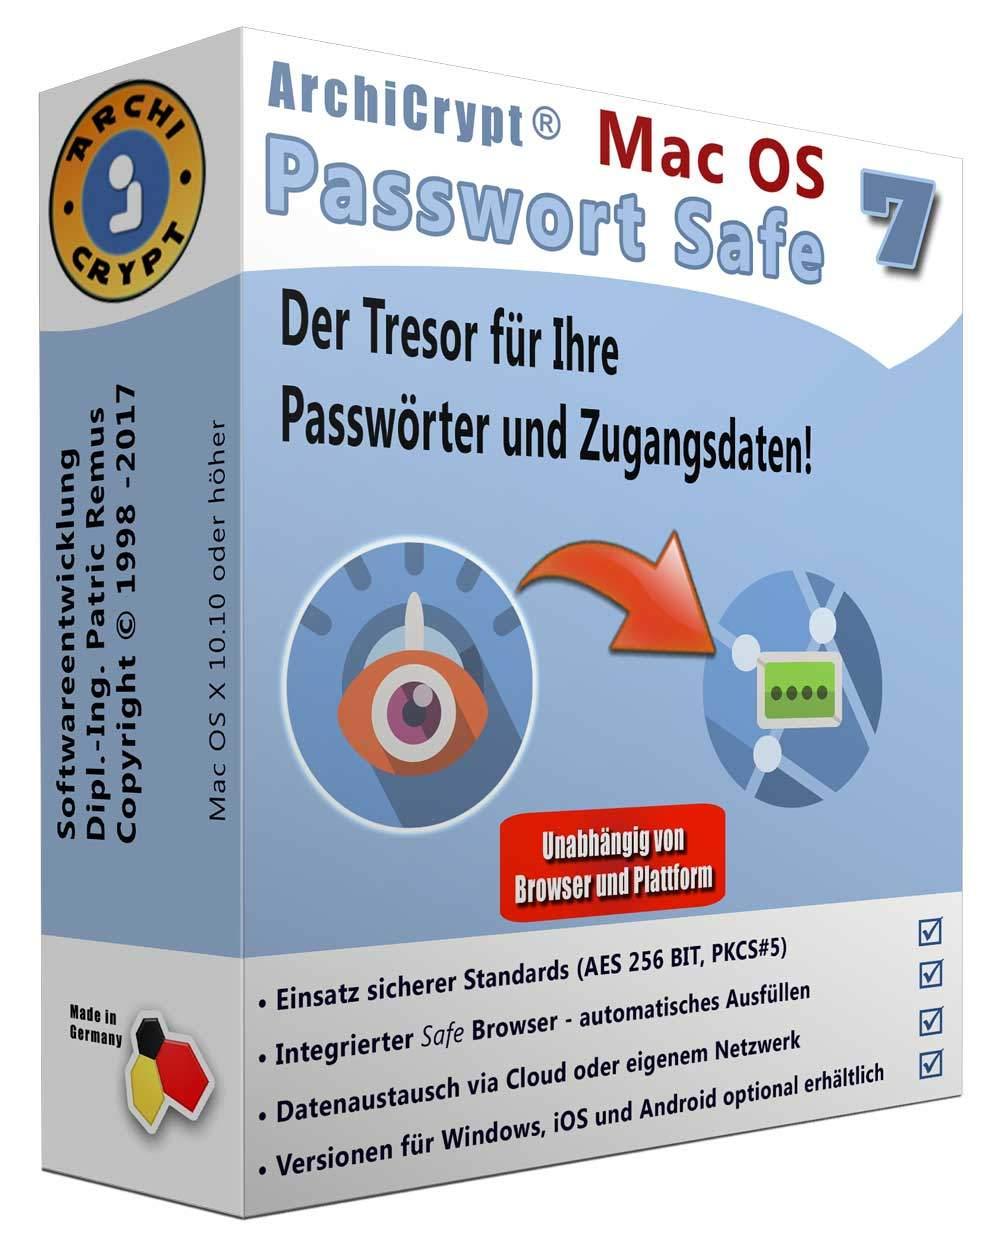 BOX-ArchiCrypt-Passwort-Safe-Mac